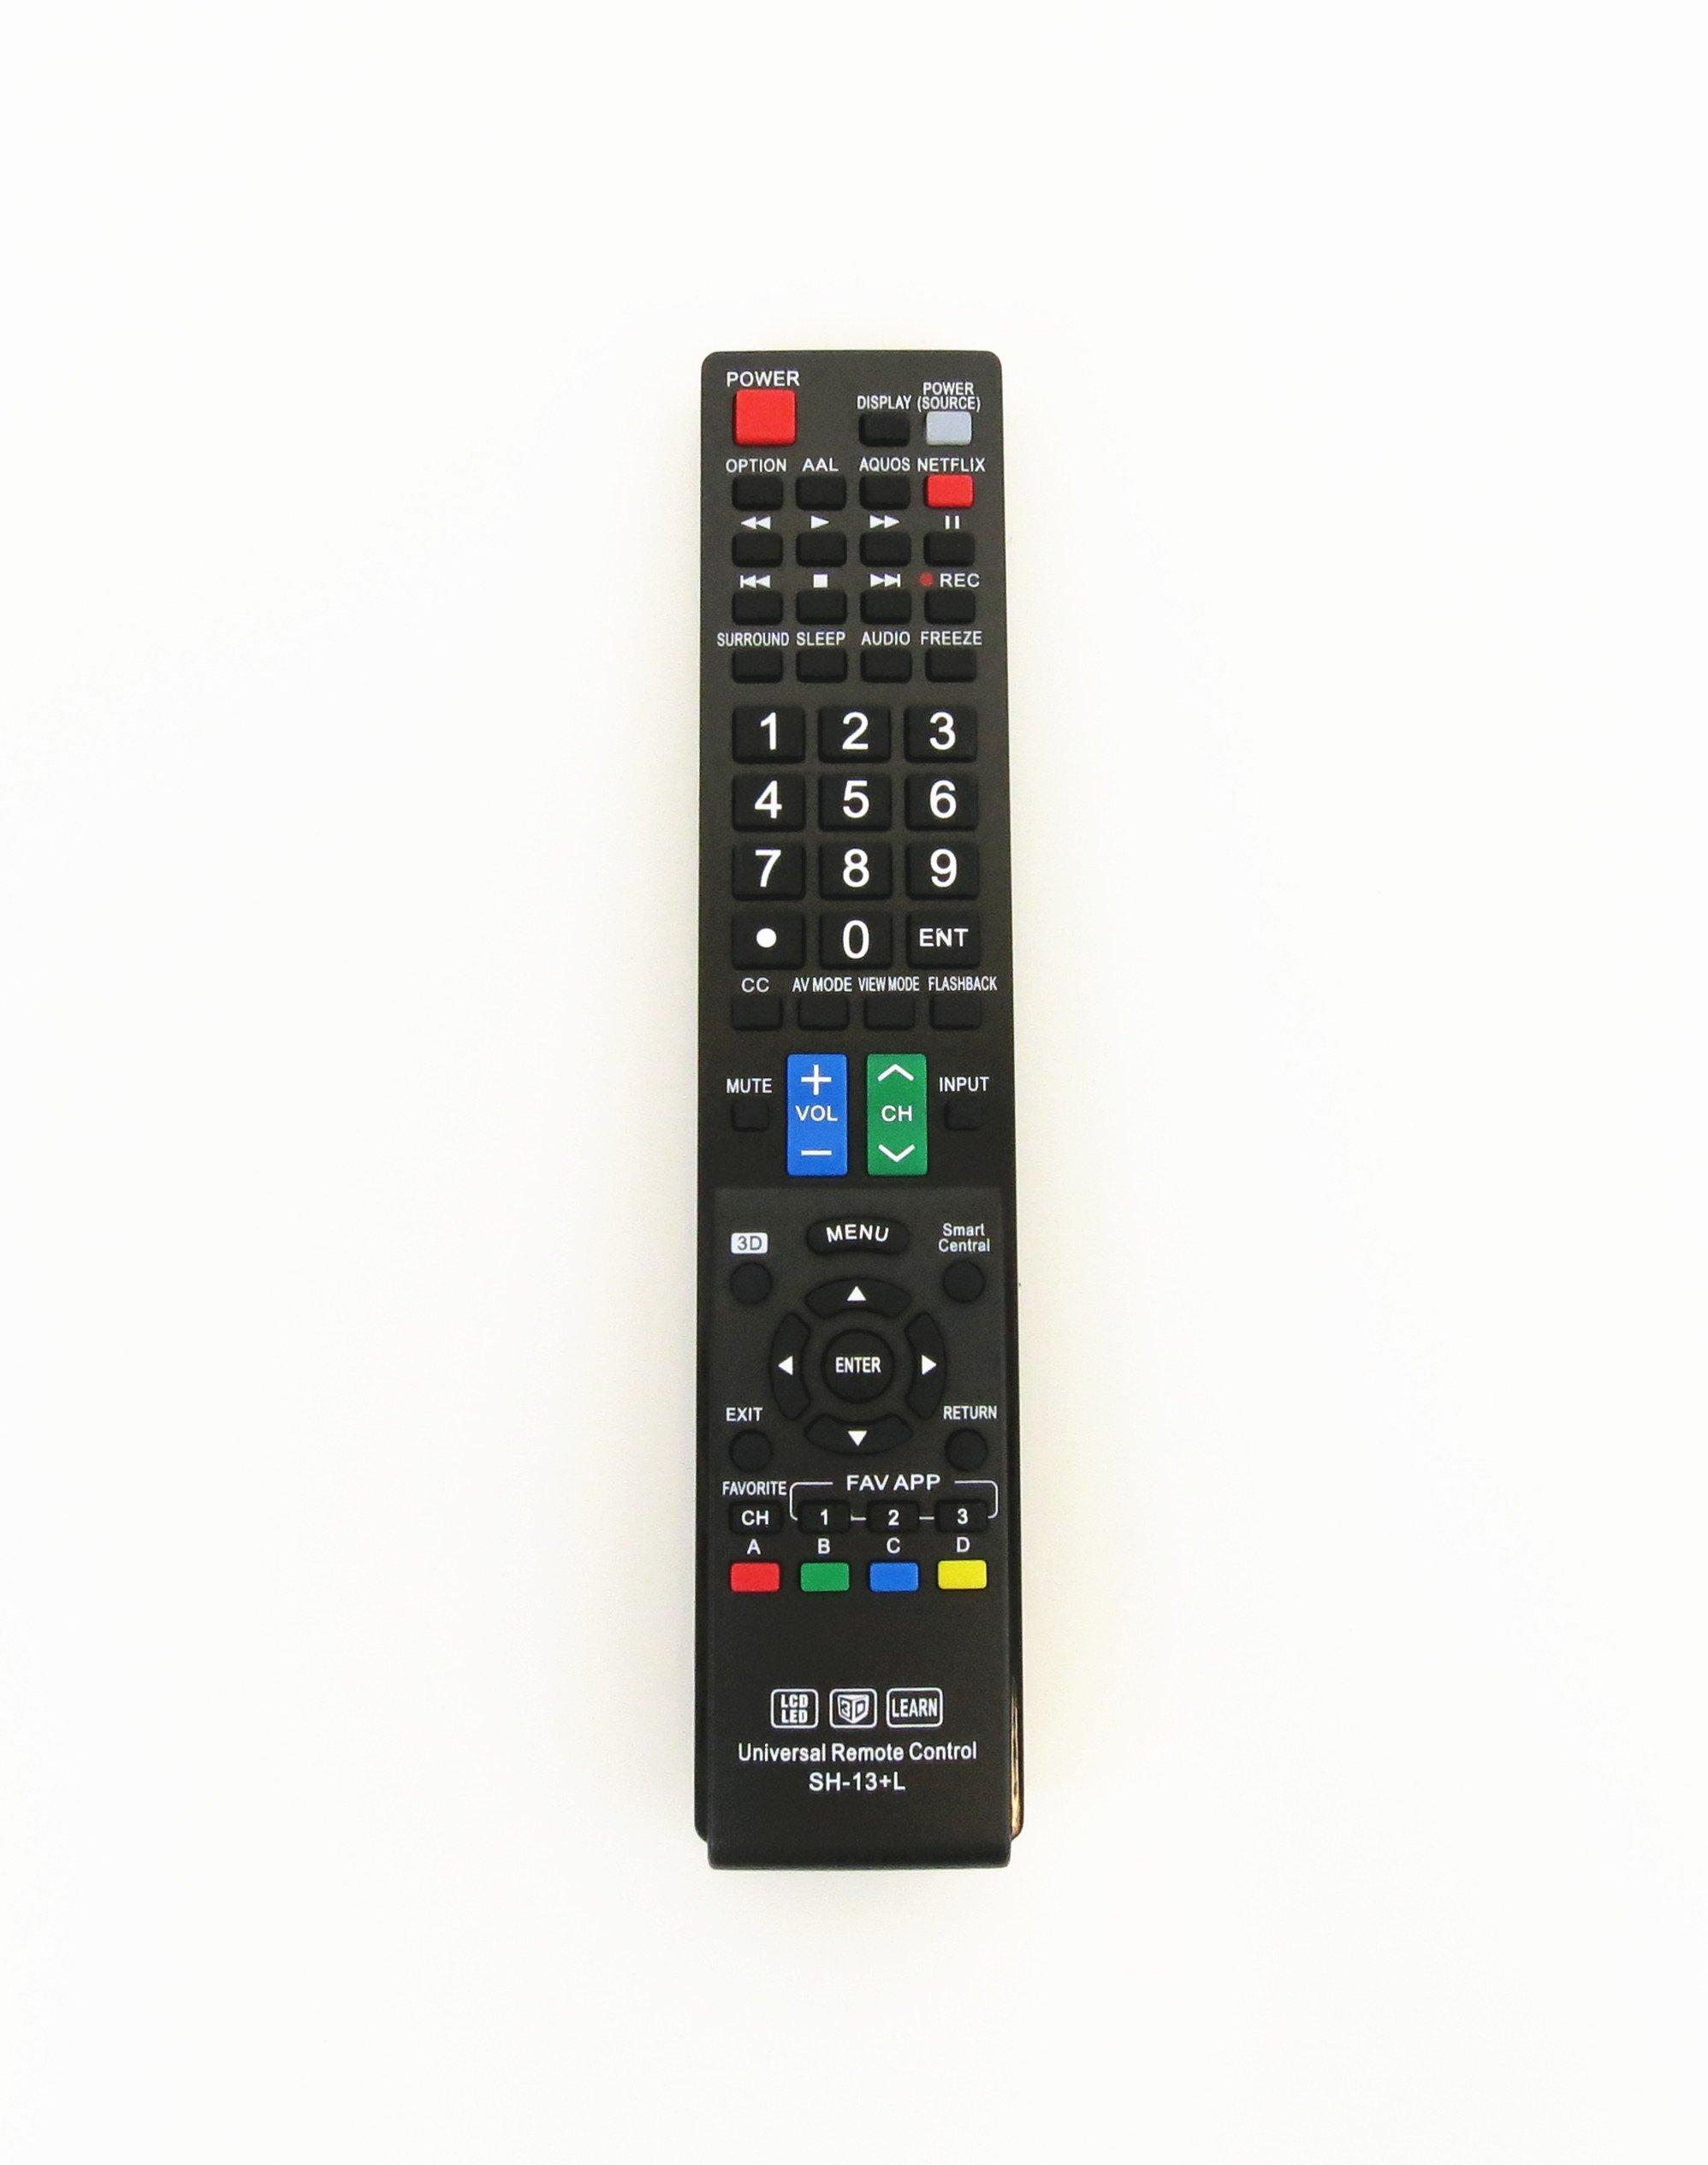 Gvirtue Universal Remote Control Compatible Replacement for Sharp Smart TV/HDTV/ 3D/ LCD/LED, GA935WJSA GA806WJSA GA840WJSA GA480WJSB GB004WJSA GB118WJSA GB004WJSA GB005WJSA GJ221-C GJ221-R